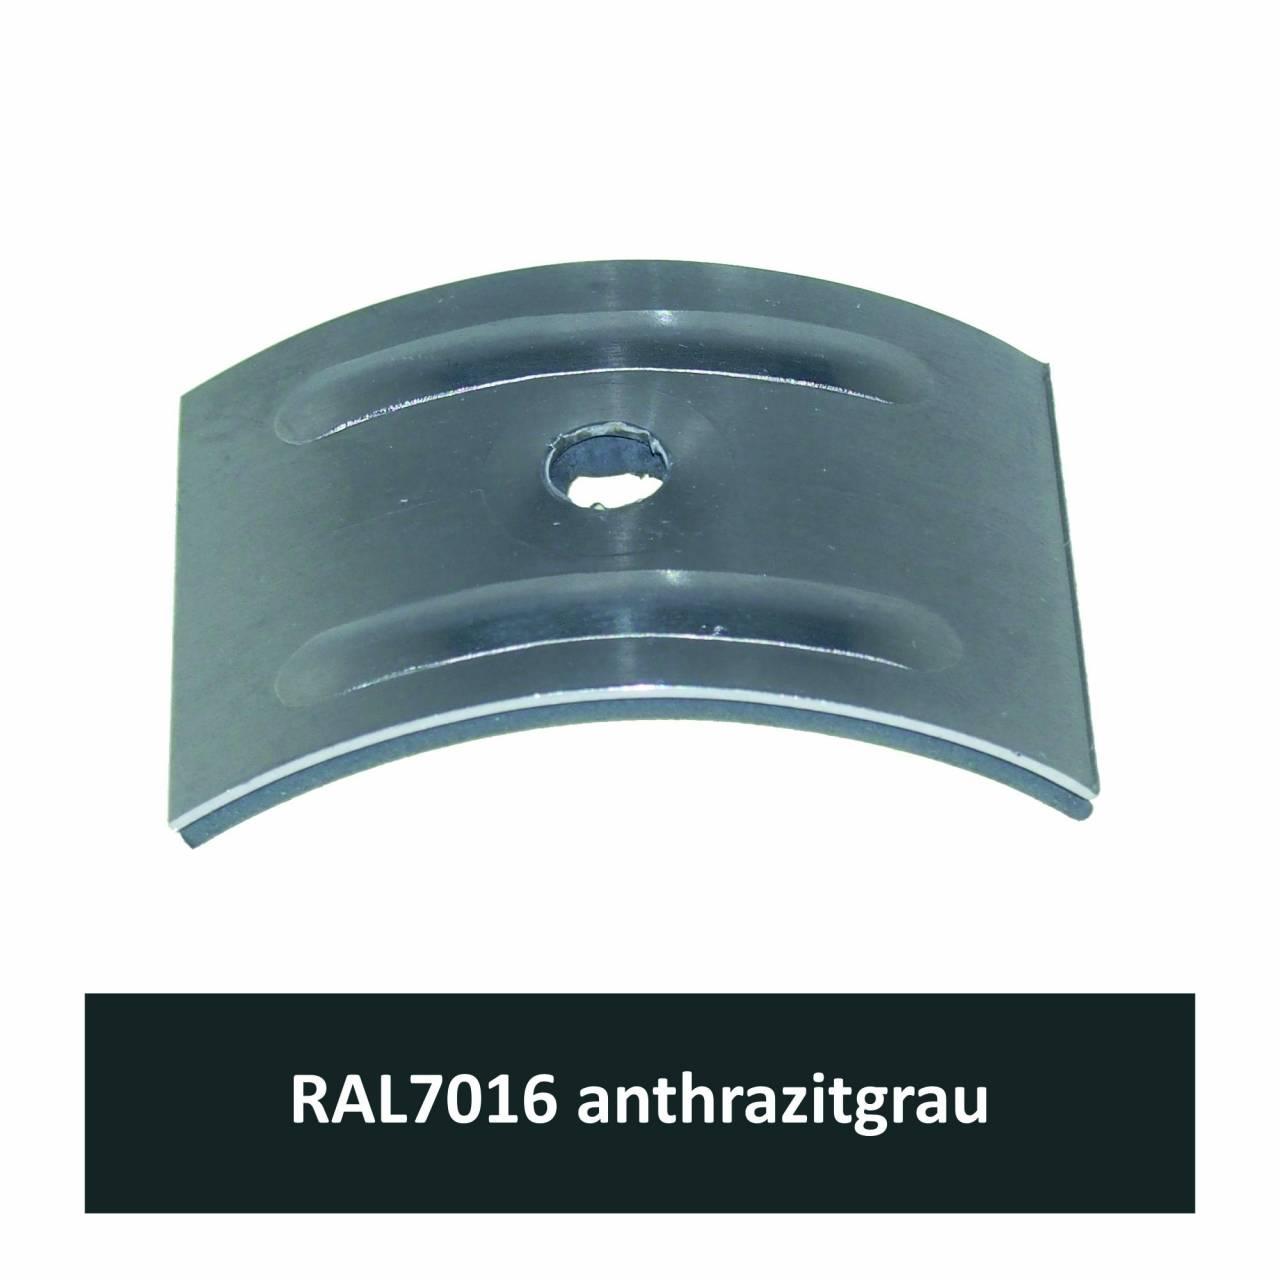 Kalotten für Welle 177/51, Alu RAL7016 anthrazitgrau / Pck a 100 Stück